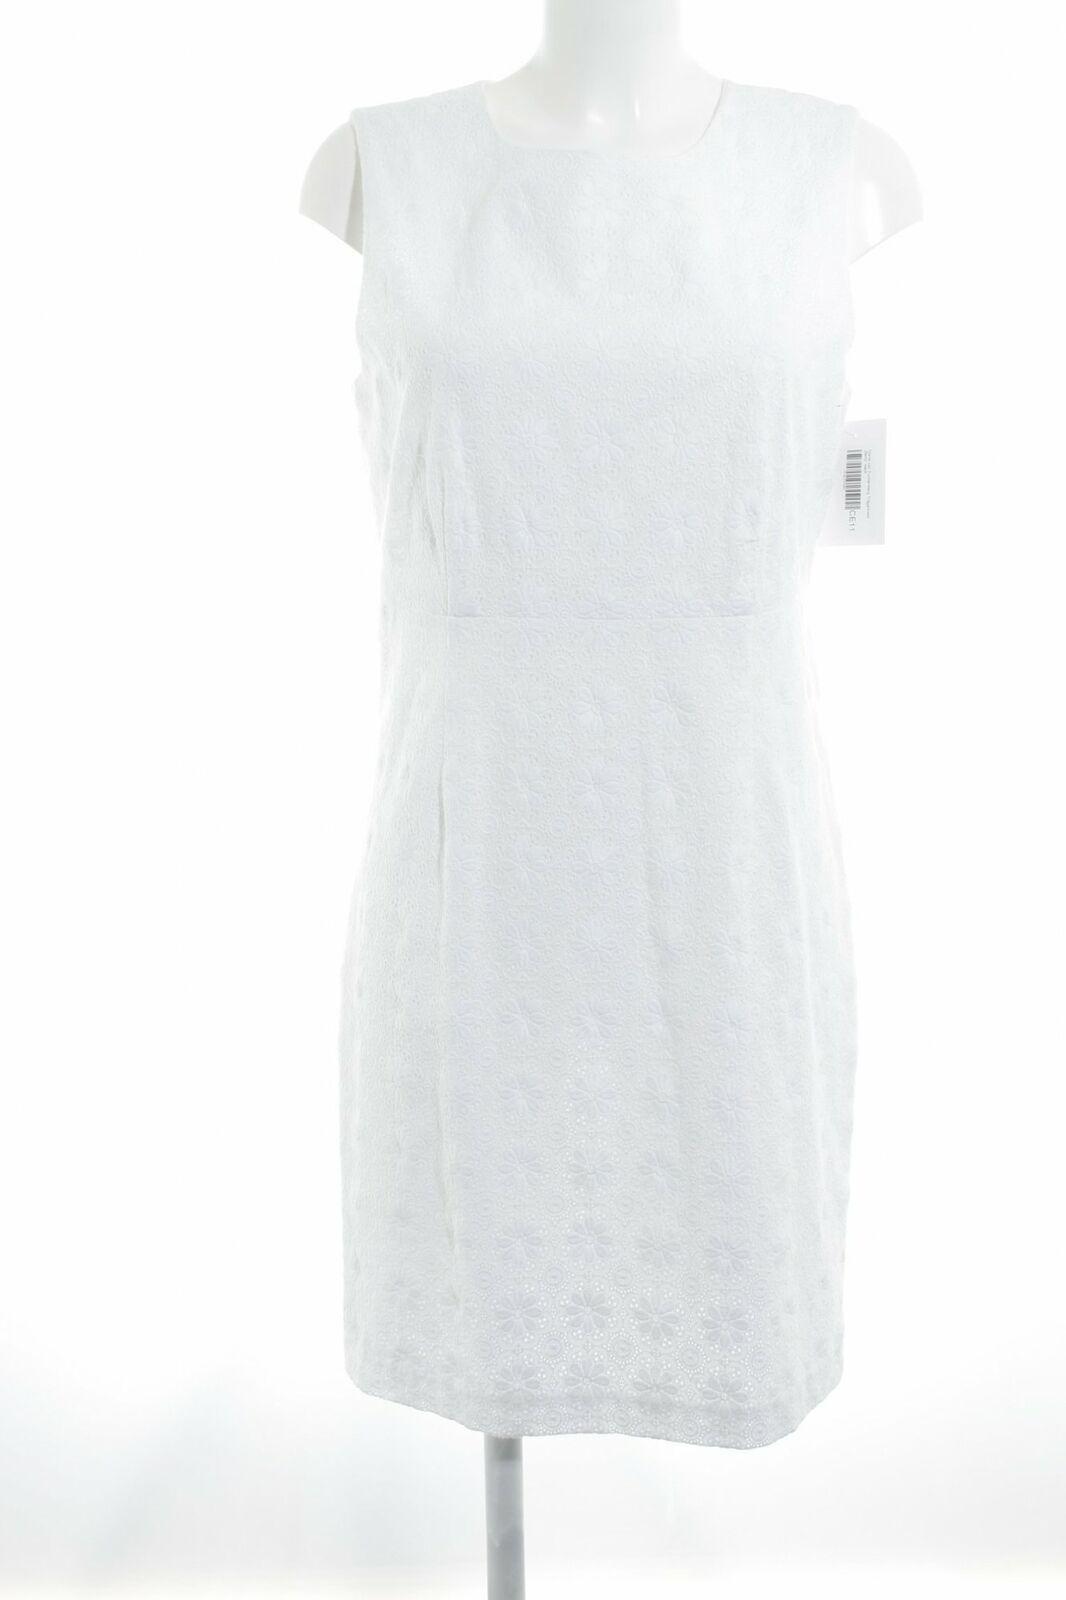 Diane Von Furstenberg abito spalline    Betty  Bianco Donna Tg. de 38 Bianco Abito Dress 0cac96